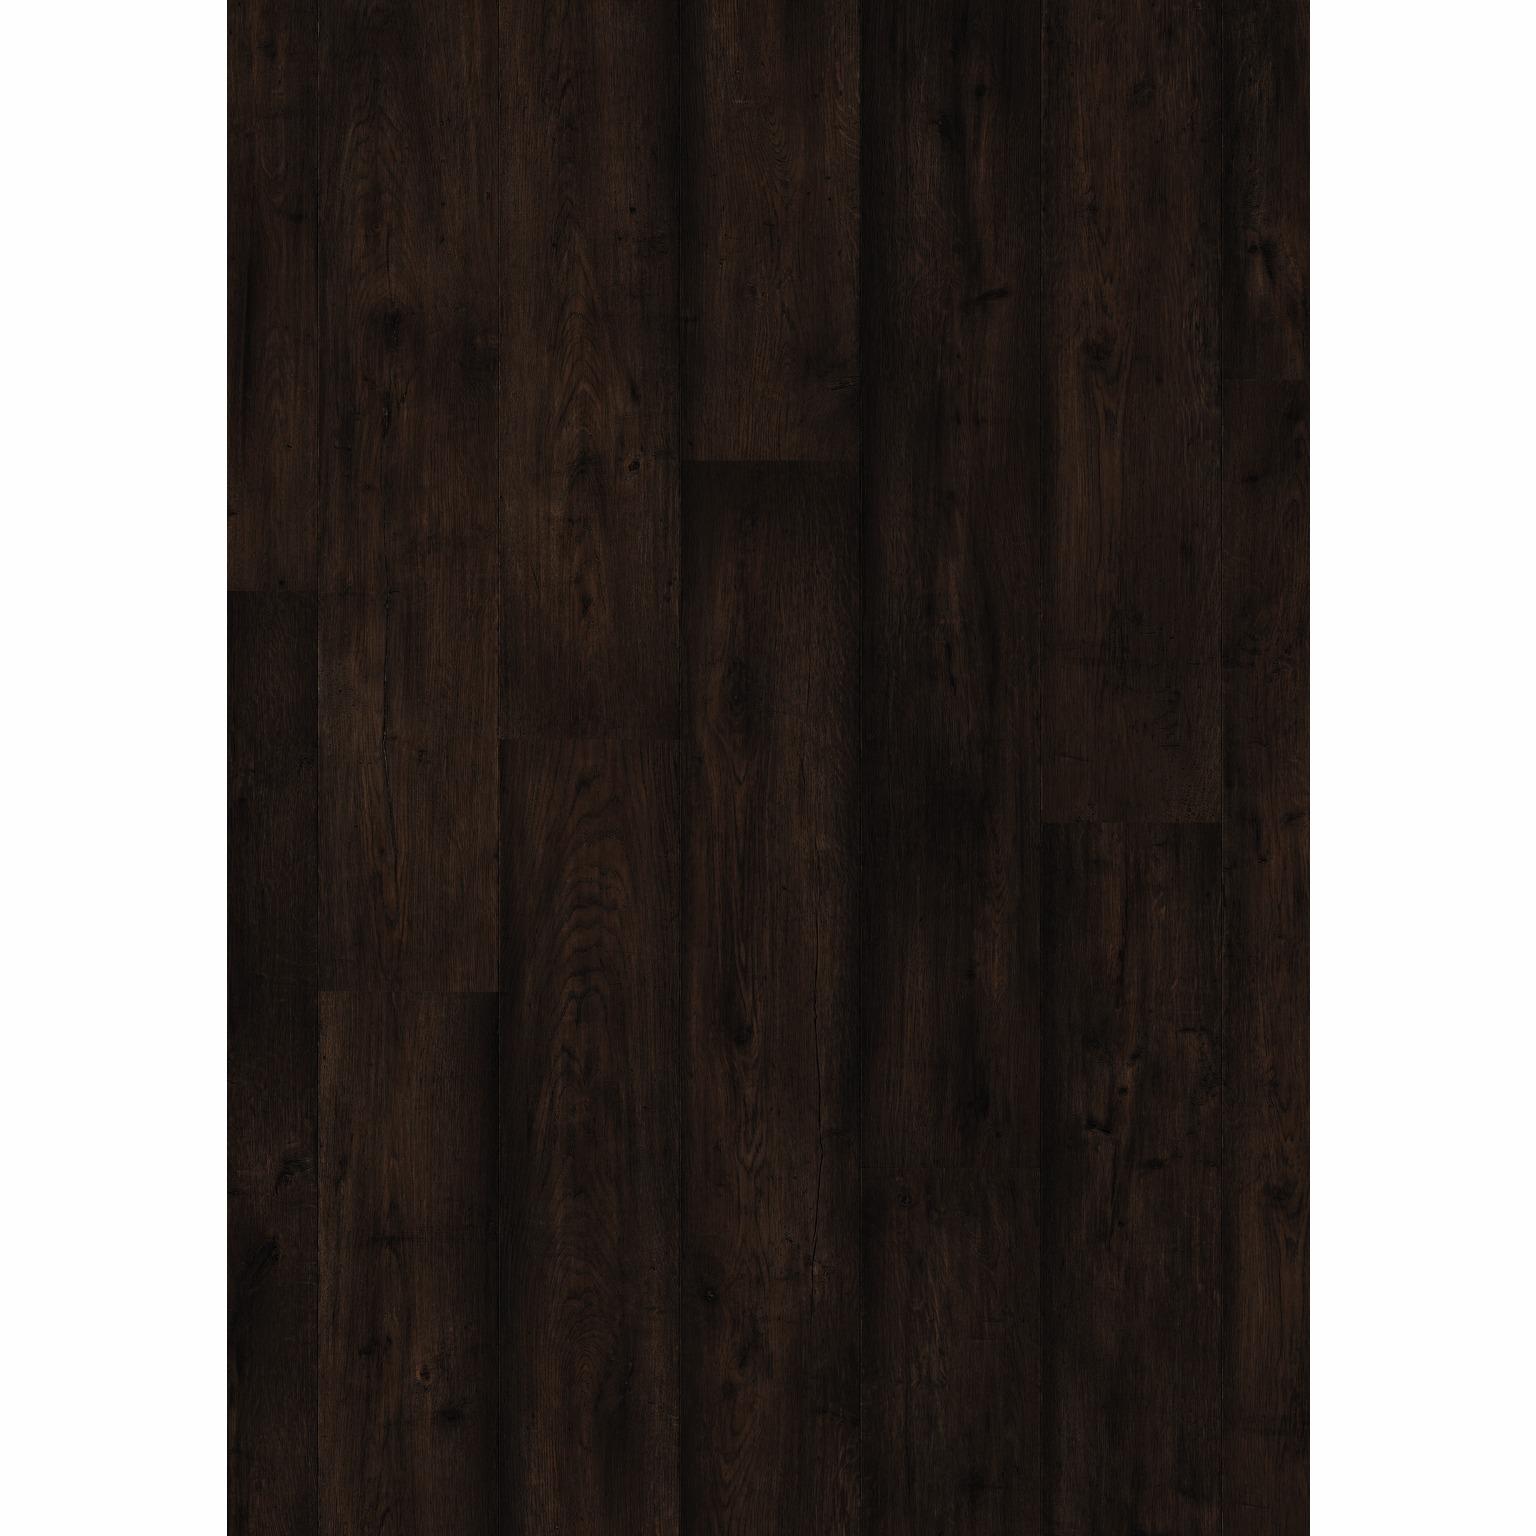 64 in environ 5.08 cm Golden Oak 2 in L 2-Pack environ 149.86 cm L x 59 in Bois Véritable aveugle environ 162.56 cm